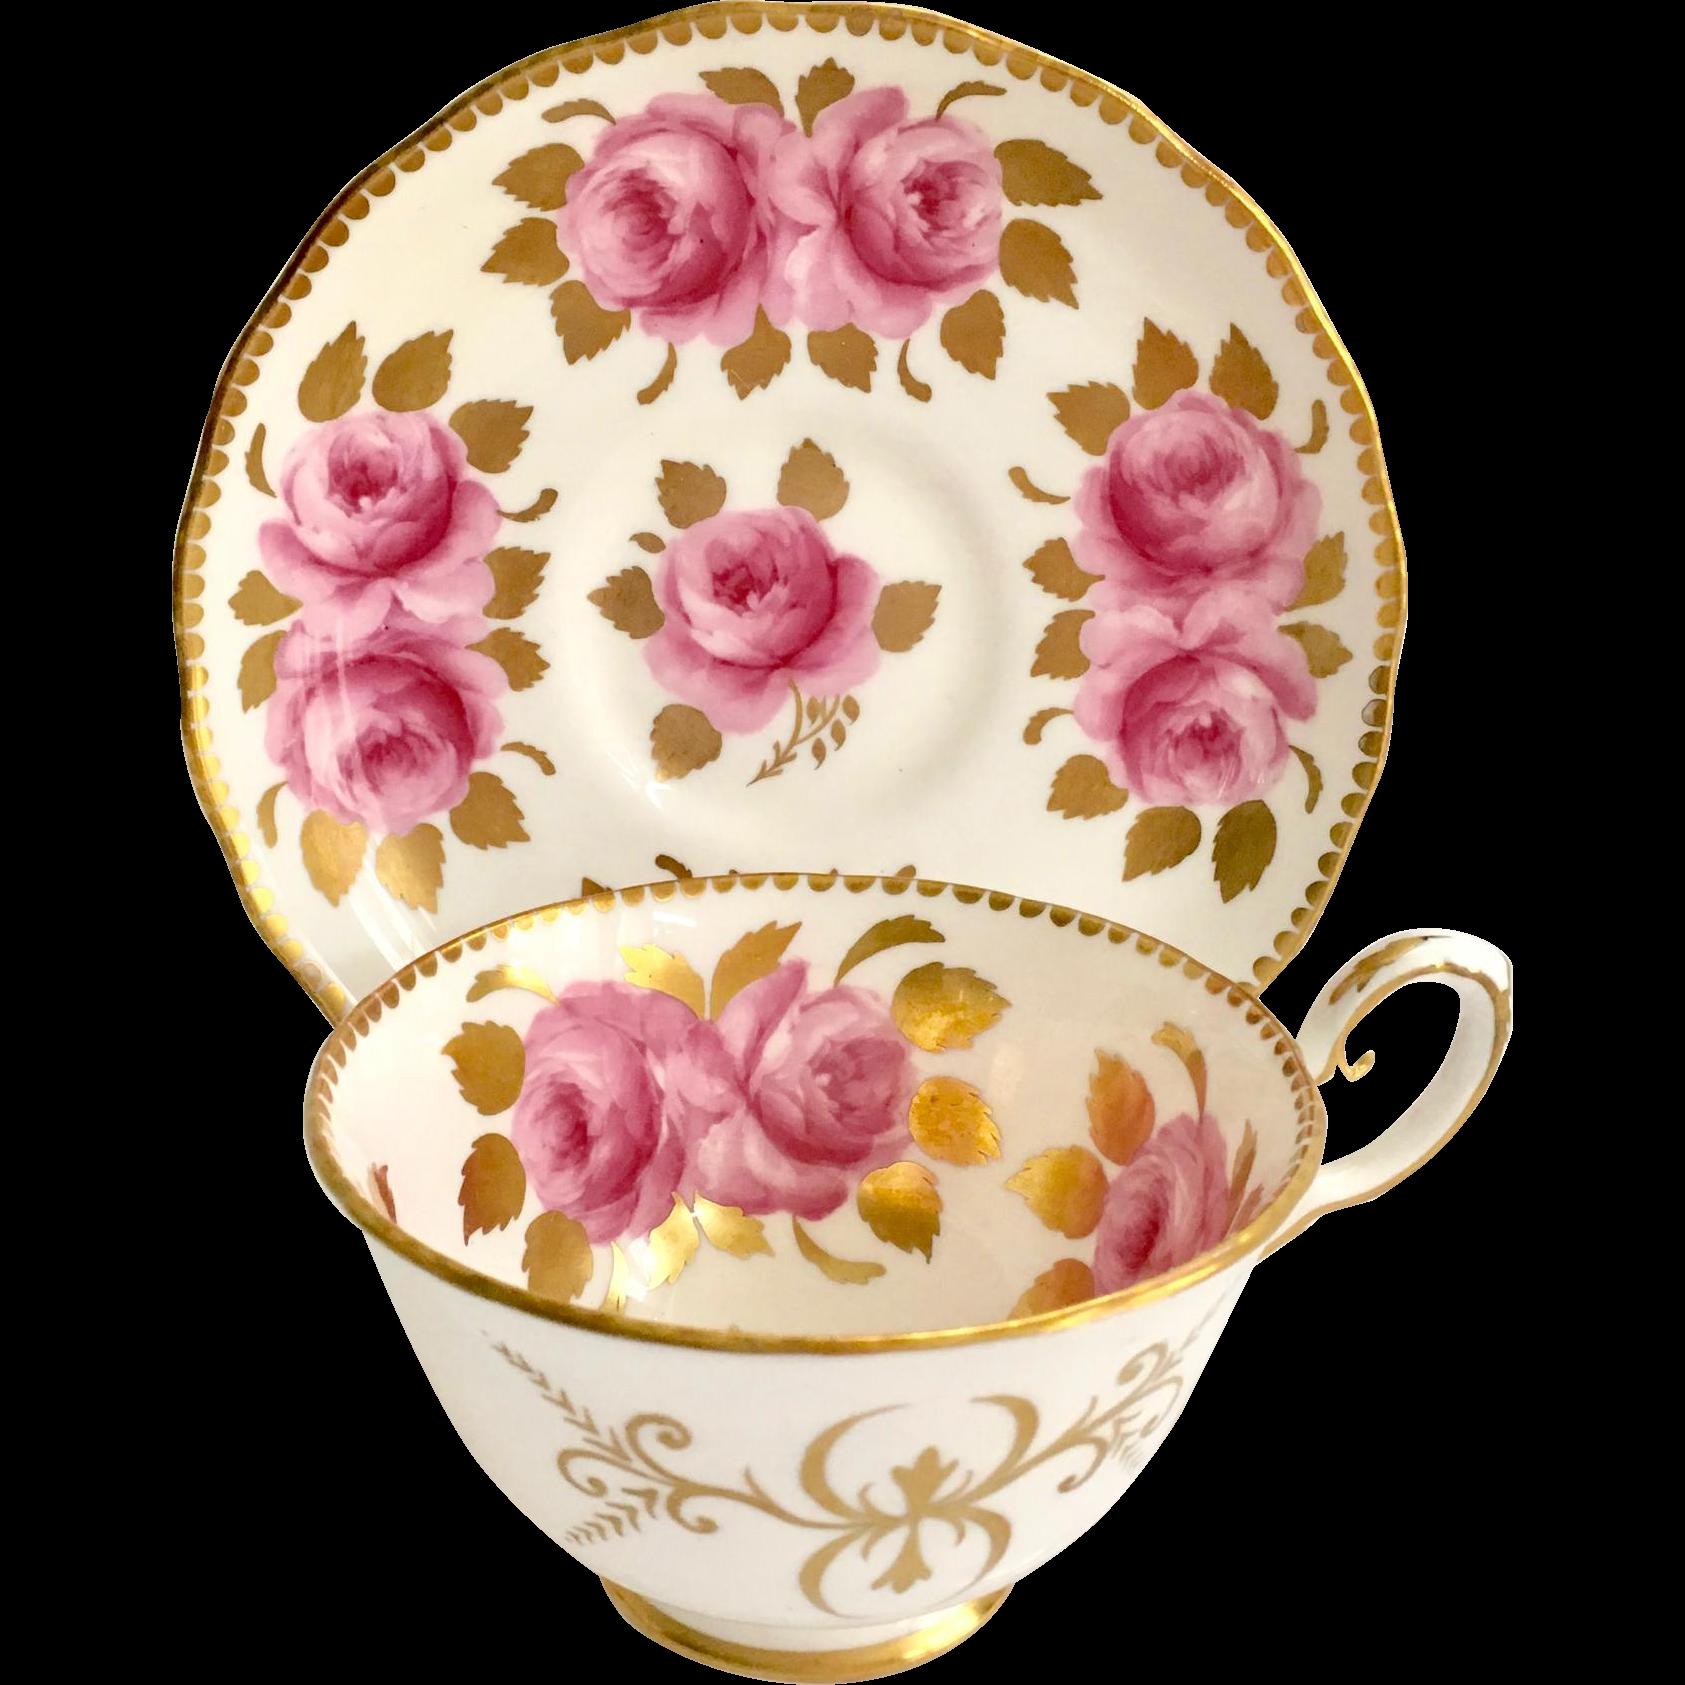 Royal chelsea bone china. Floral clipart teacup